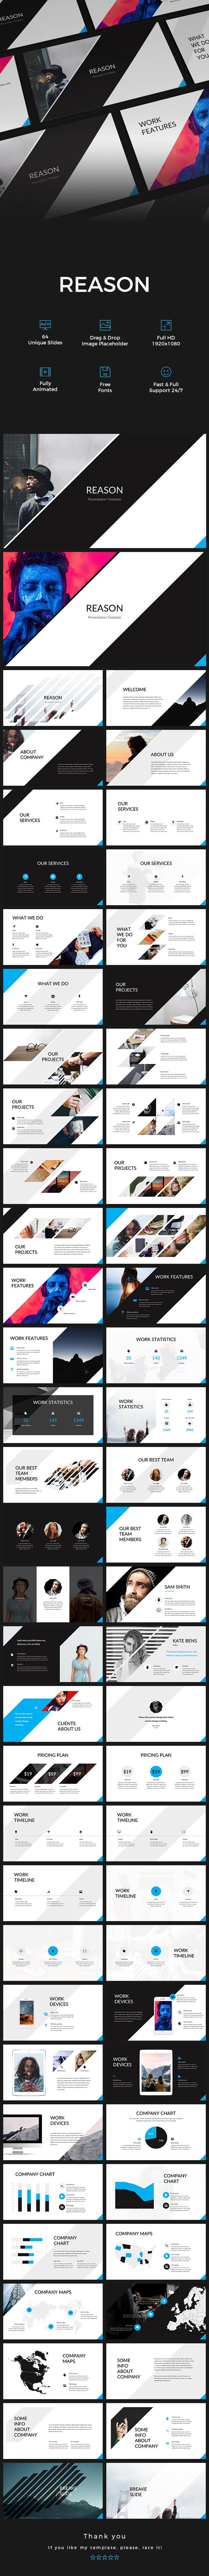 Reason PowerPoint Presentation - PowerPoint Templates Presentation Templates